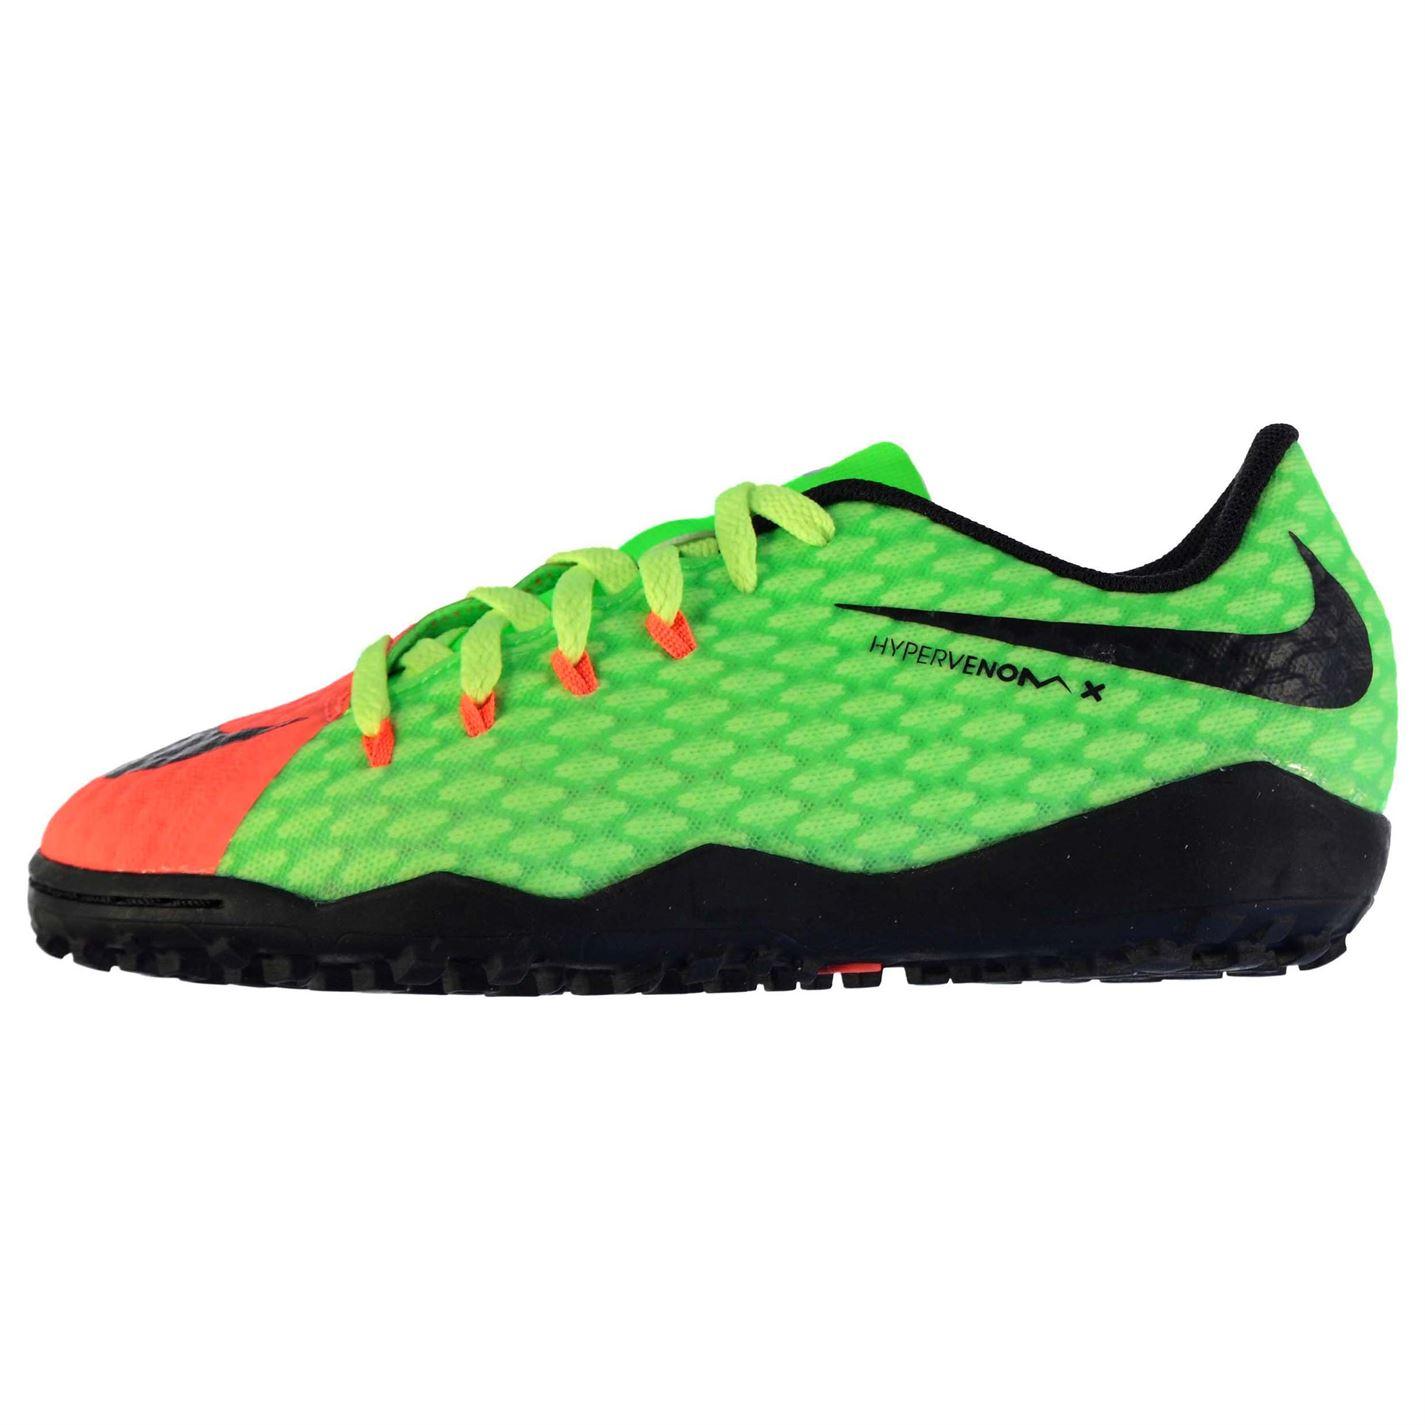 Nike Hypervenom III 3 Phinish Astro Turf Trainers Junior